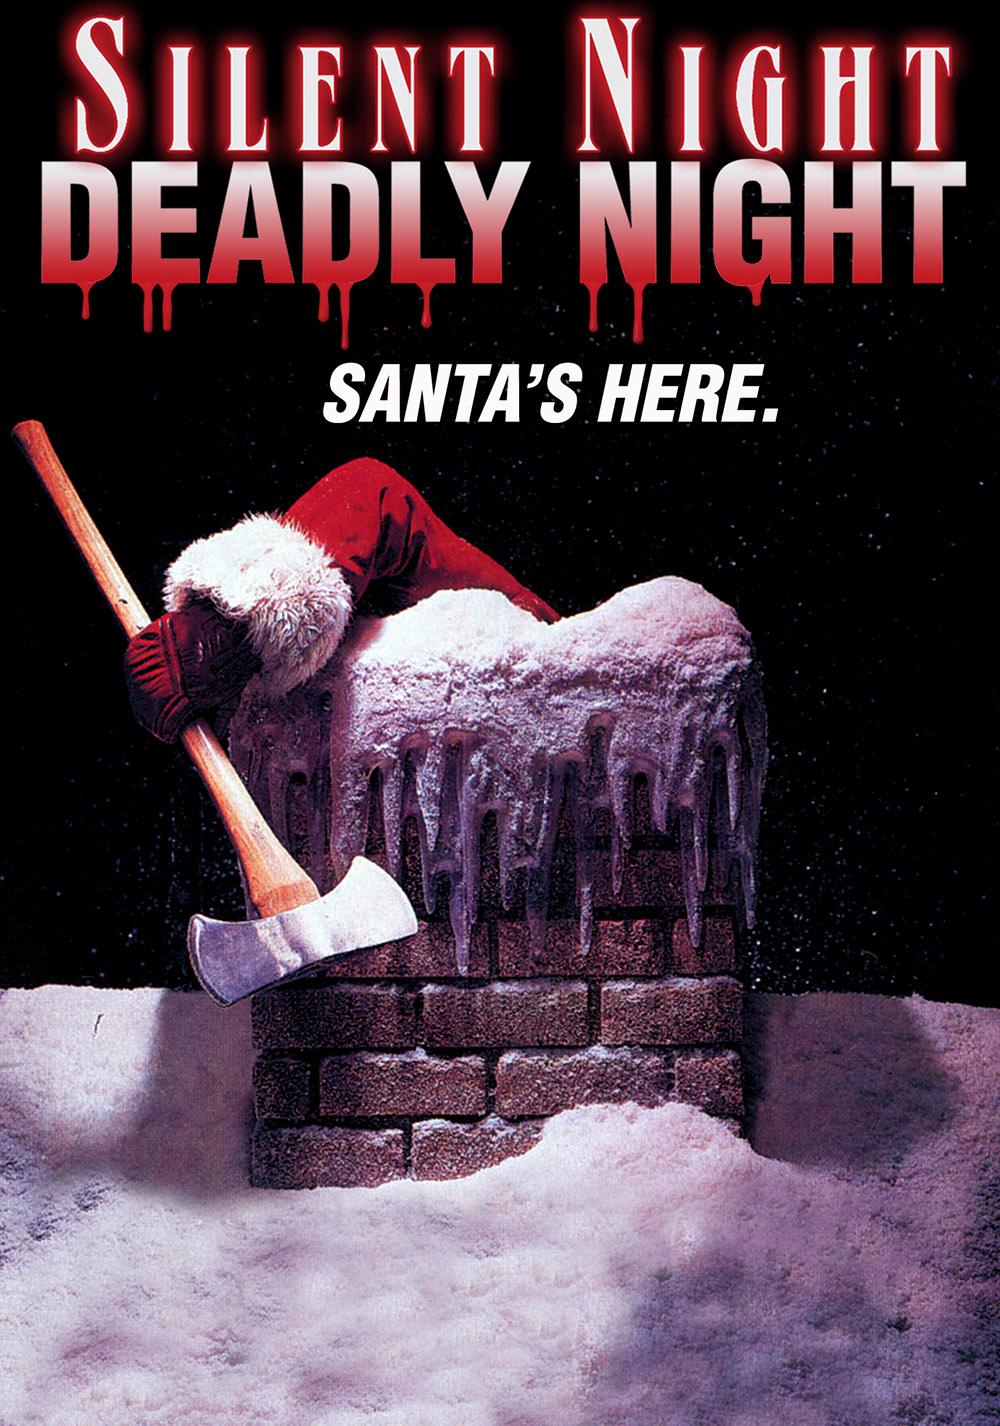 silent night deadly night movie fanart fanarttv